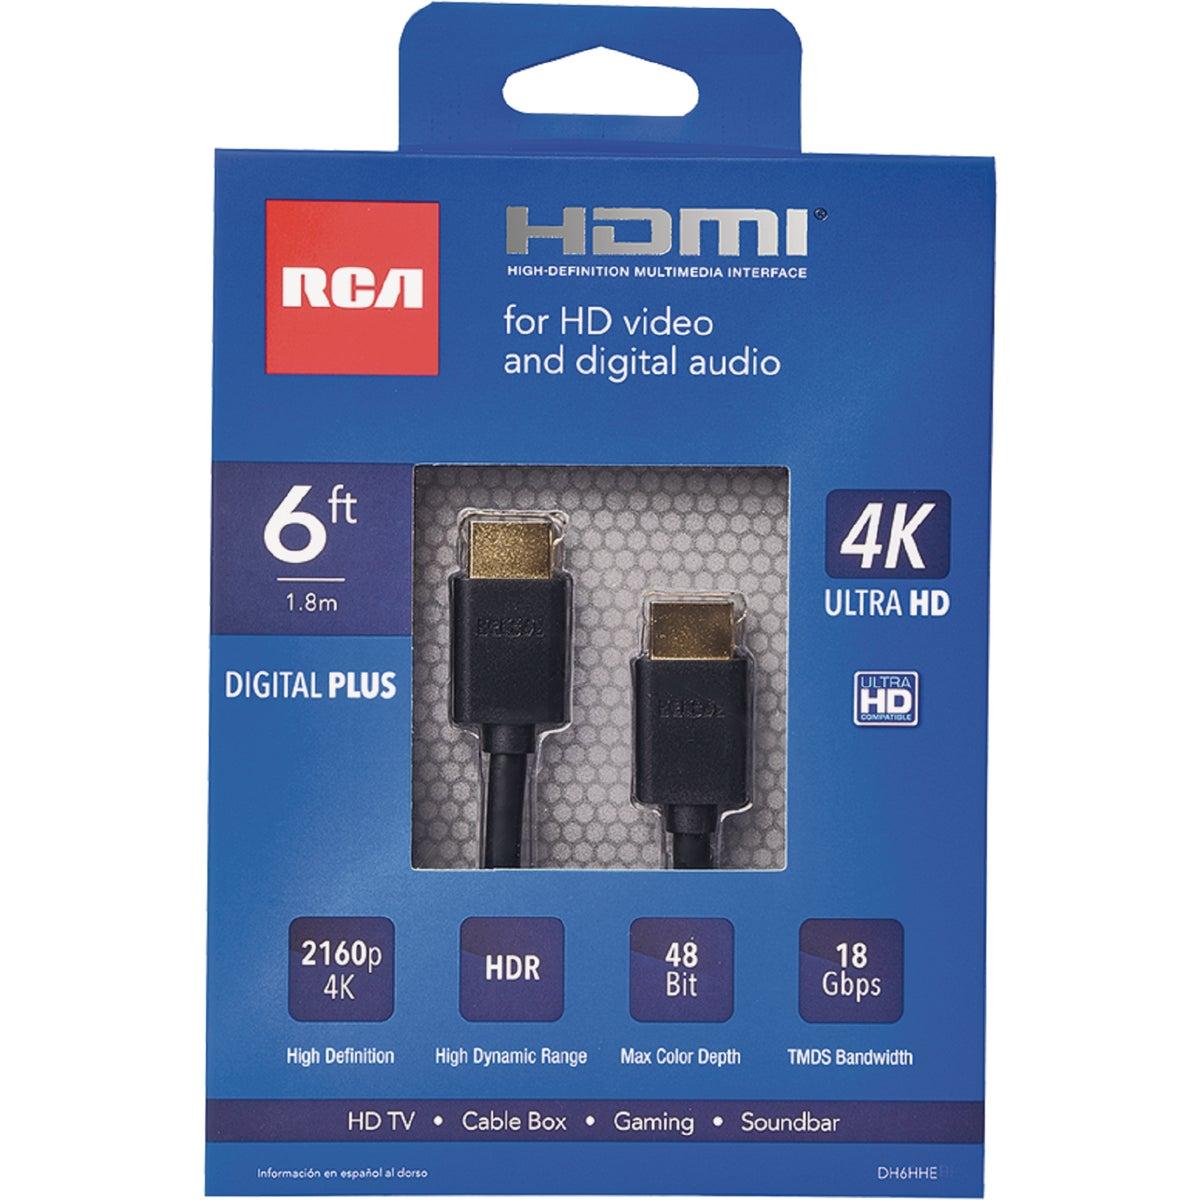 6' HDMI CABLE